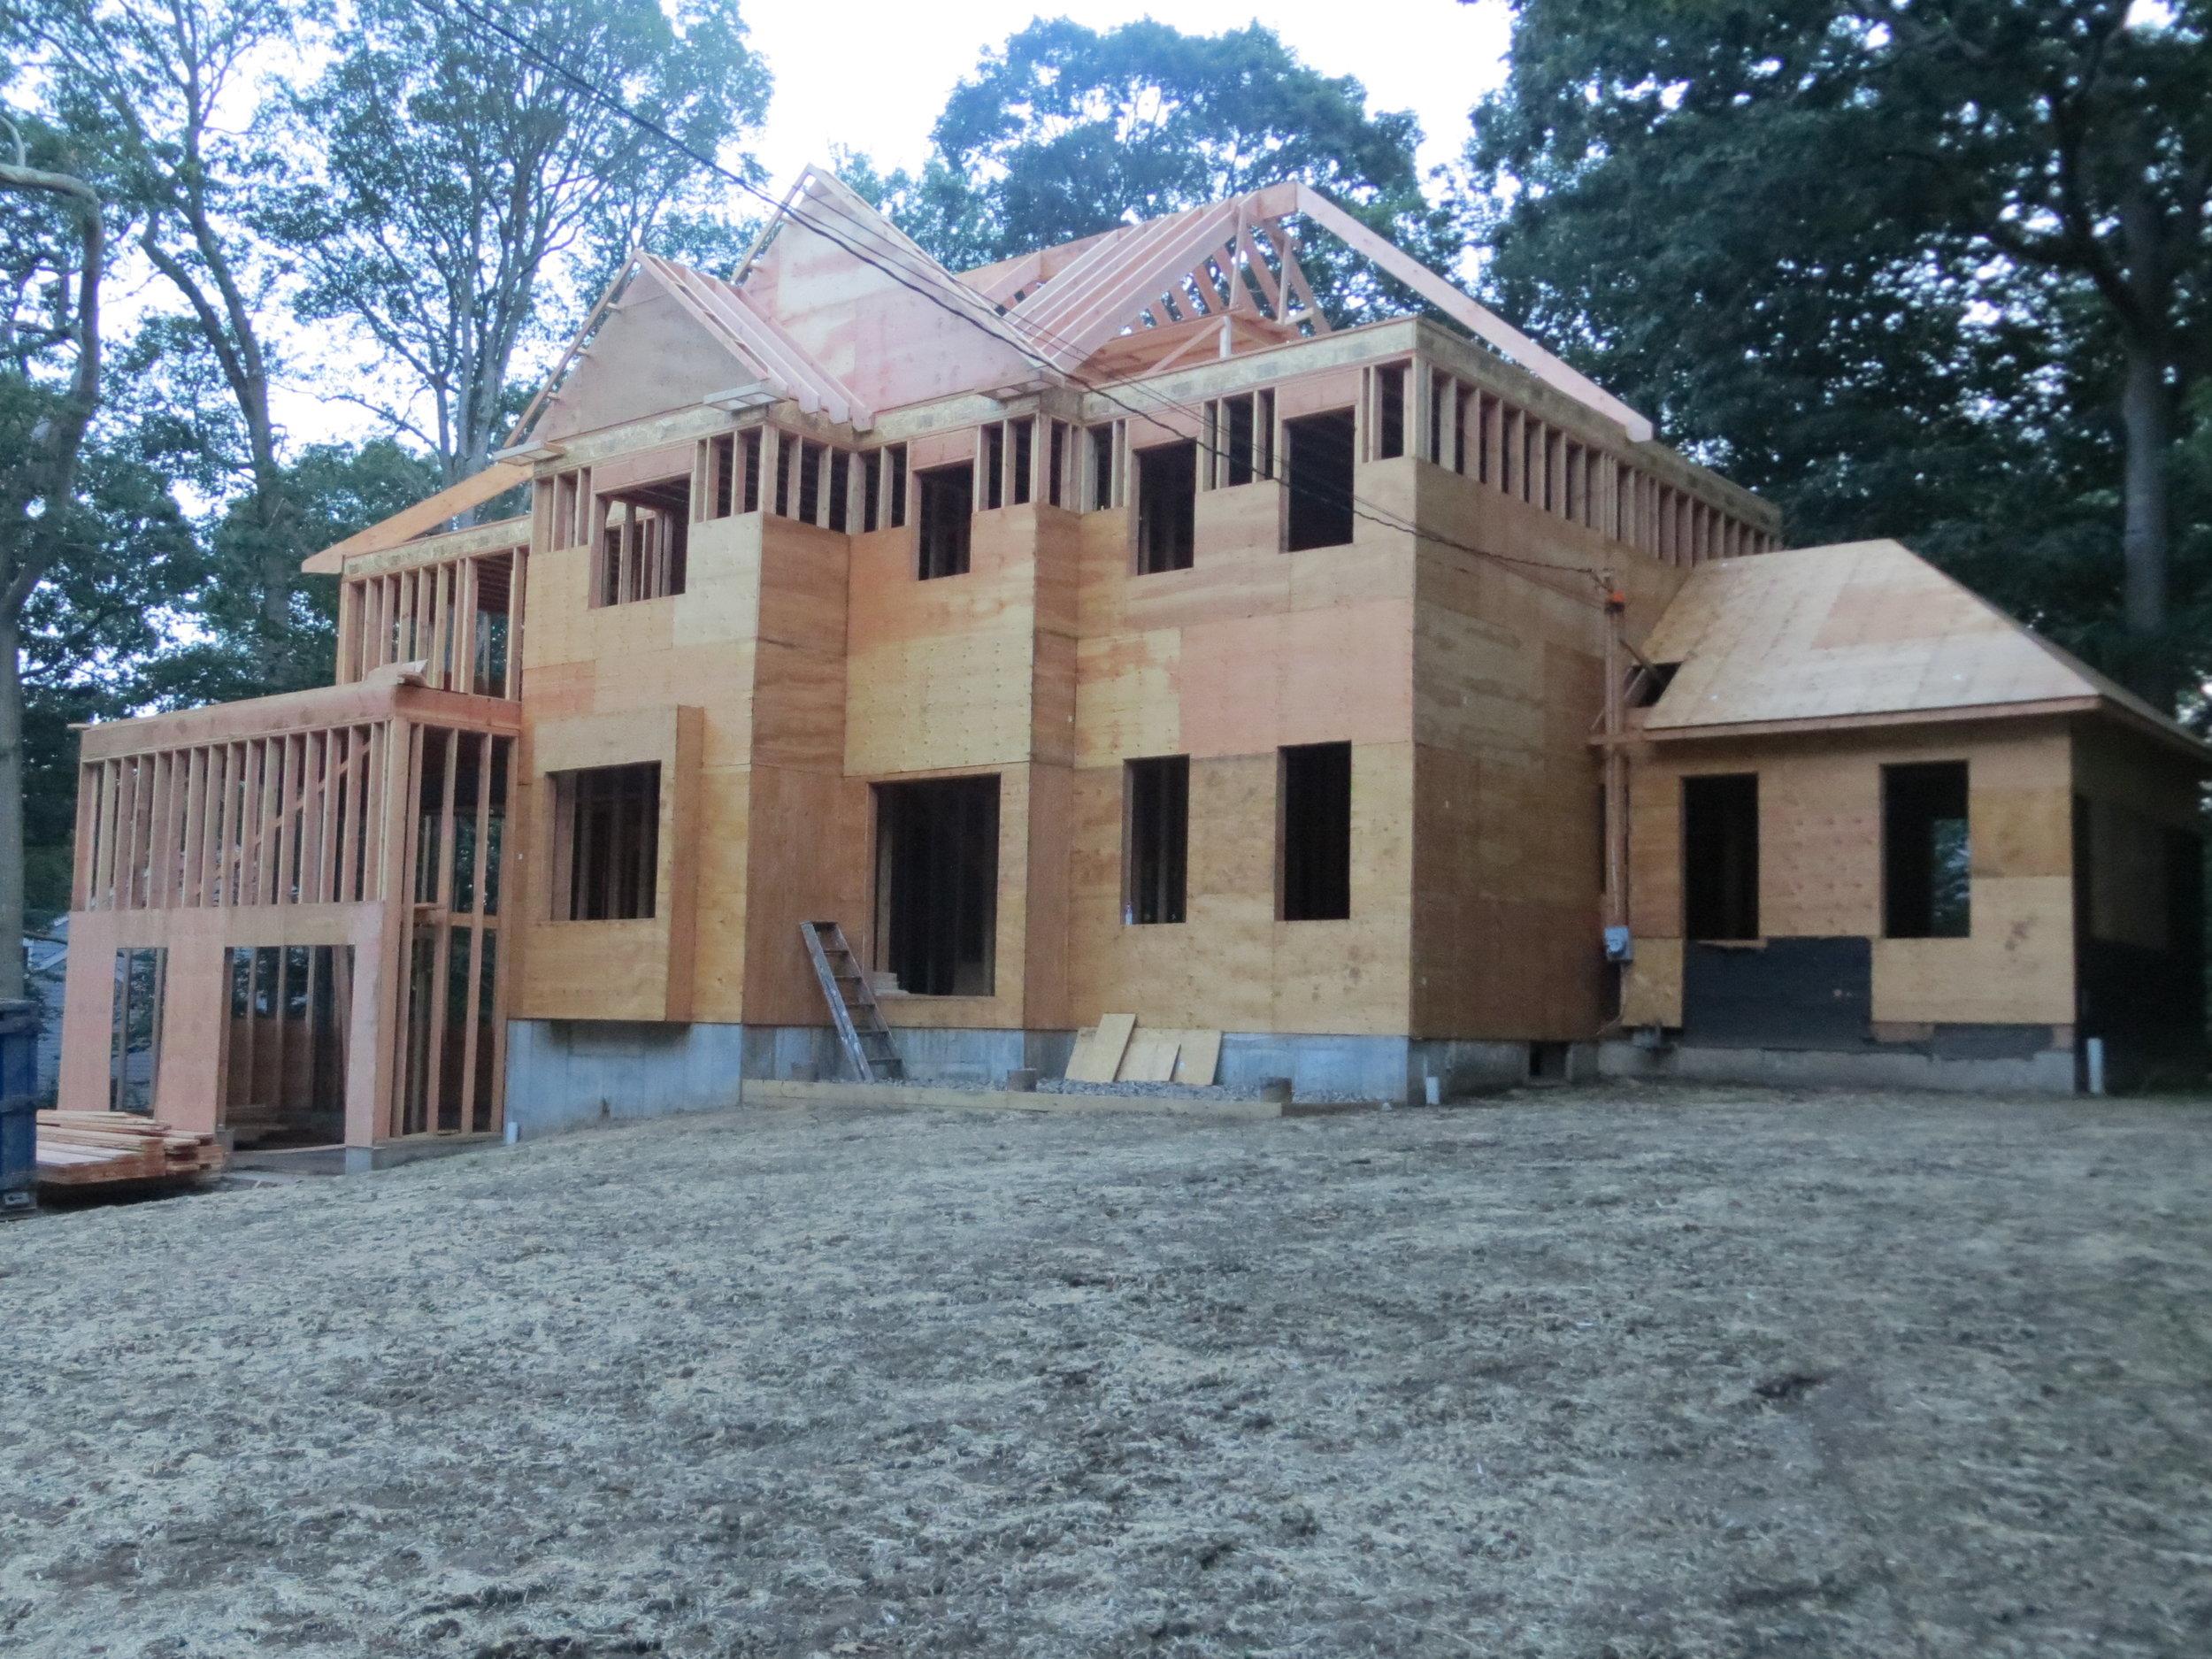 2014 07 8th Carl's House & Yard (2).JPG